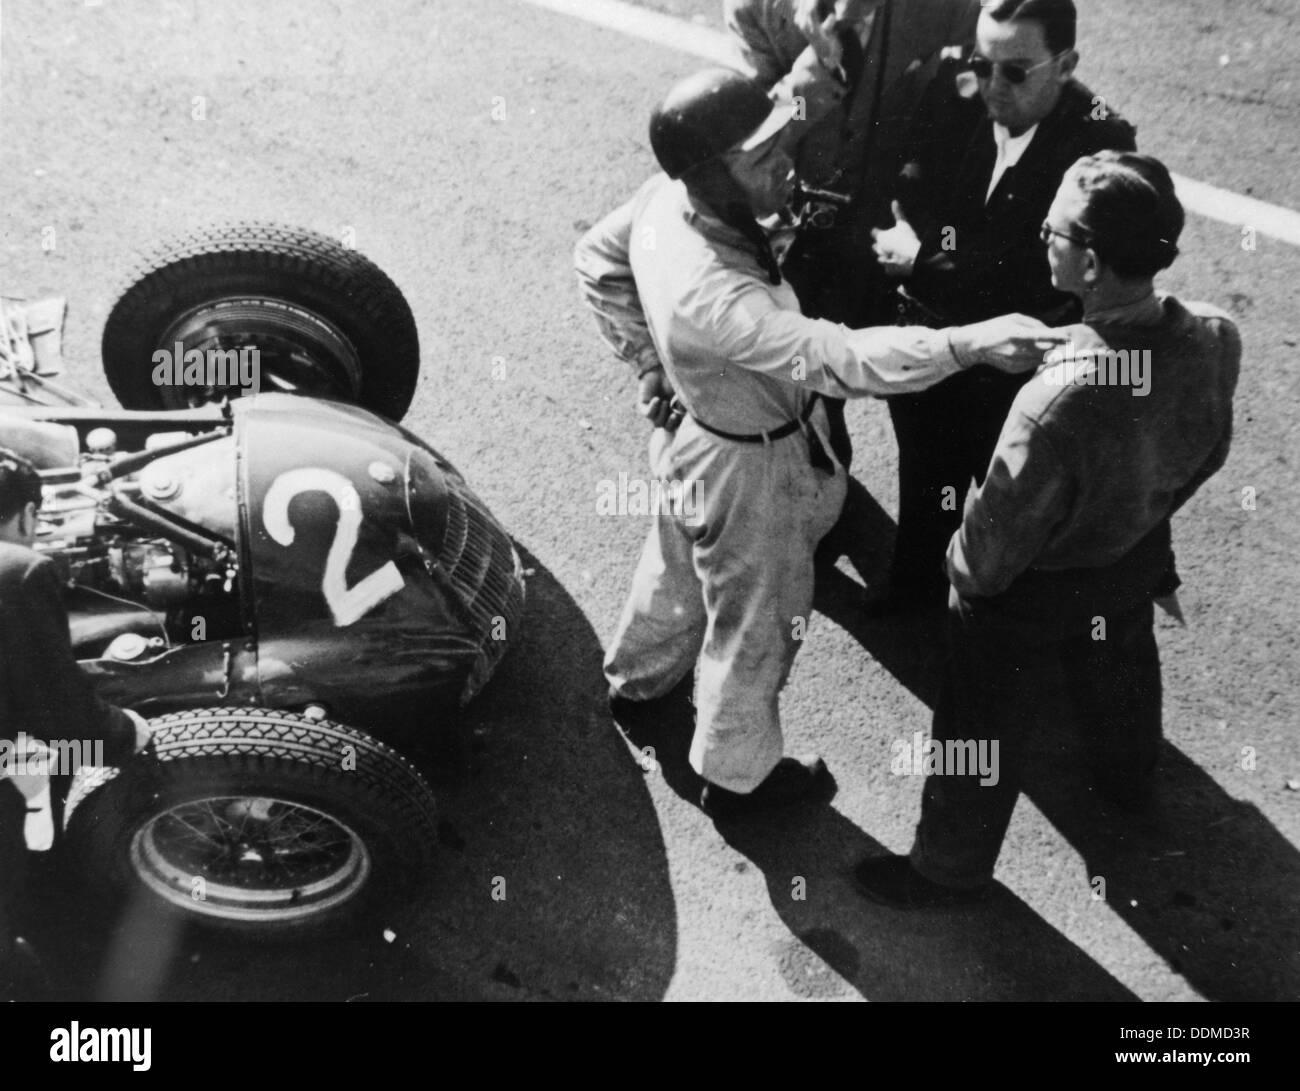 Giuseppe Farina and Alfa Romeo 159, French Grand Prix, Rheims, 1951. - Stock Image